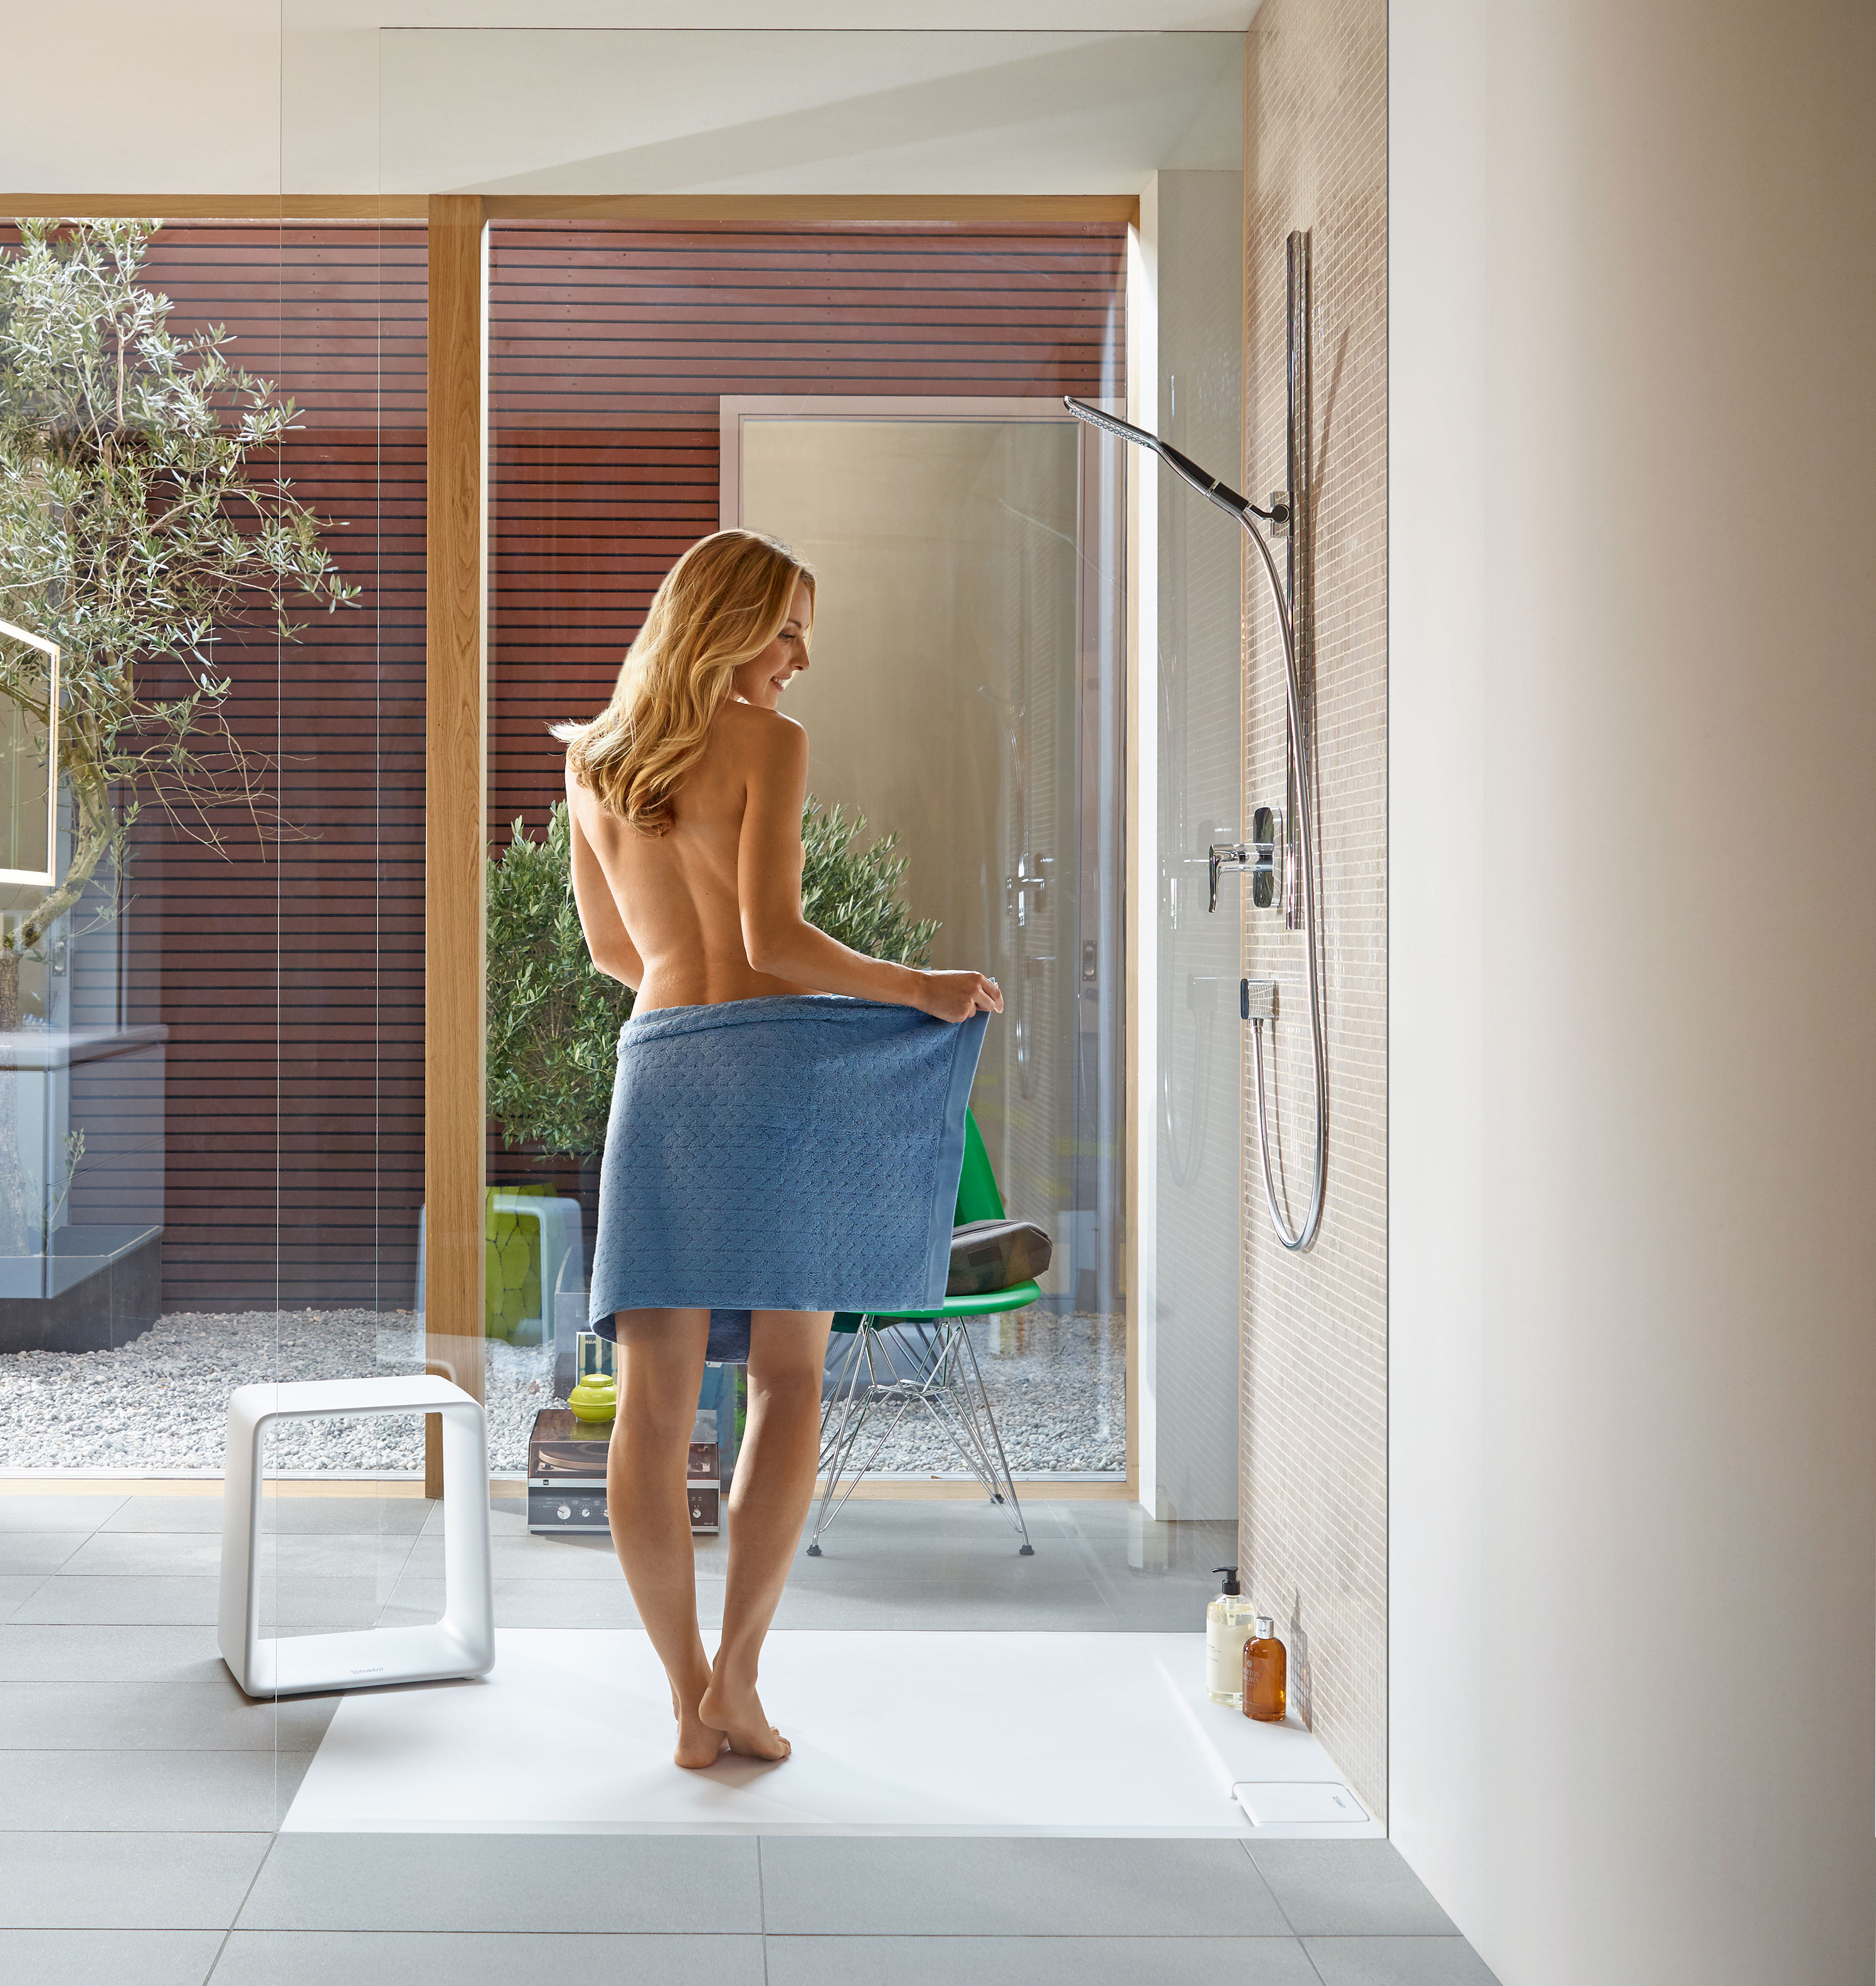 Duschabtrennung duschtrennwand aus glas duravit - Platos de ducha a ras de suelo ...